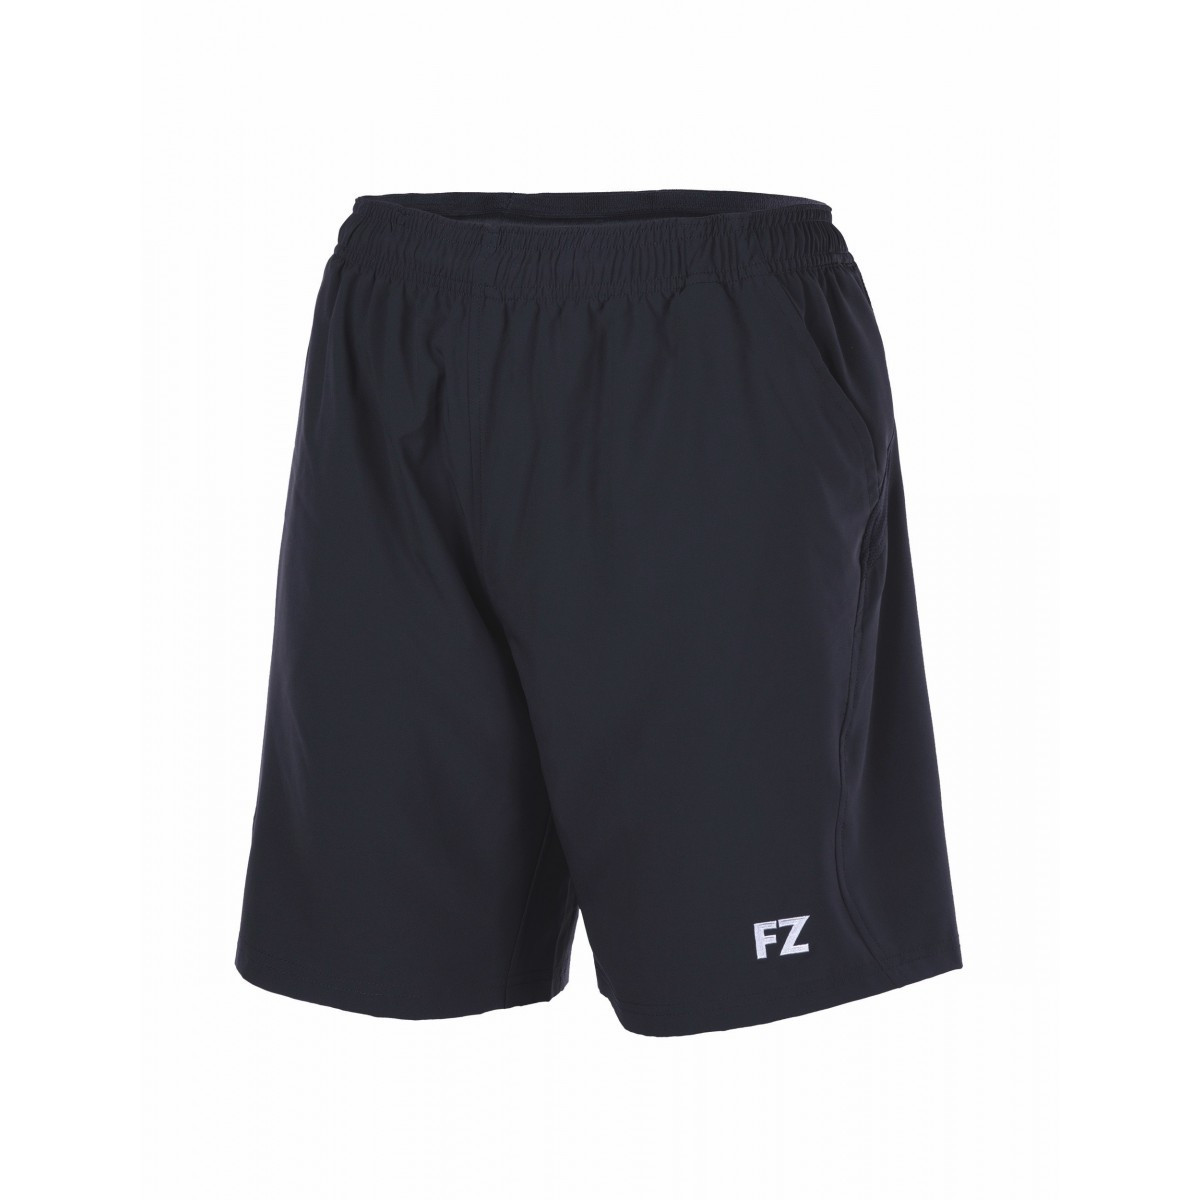 Спортивные шорты FZ FORZA Ajax Shorts Black